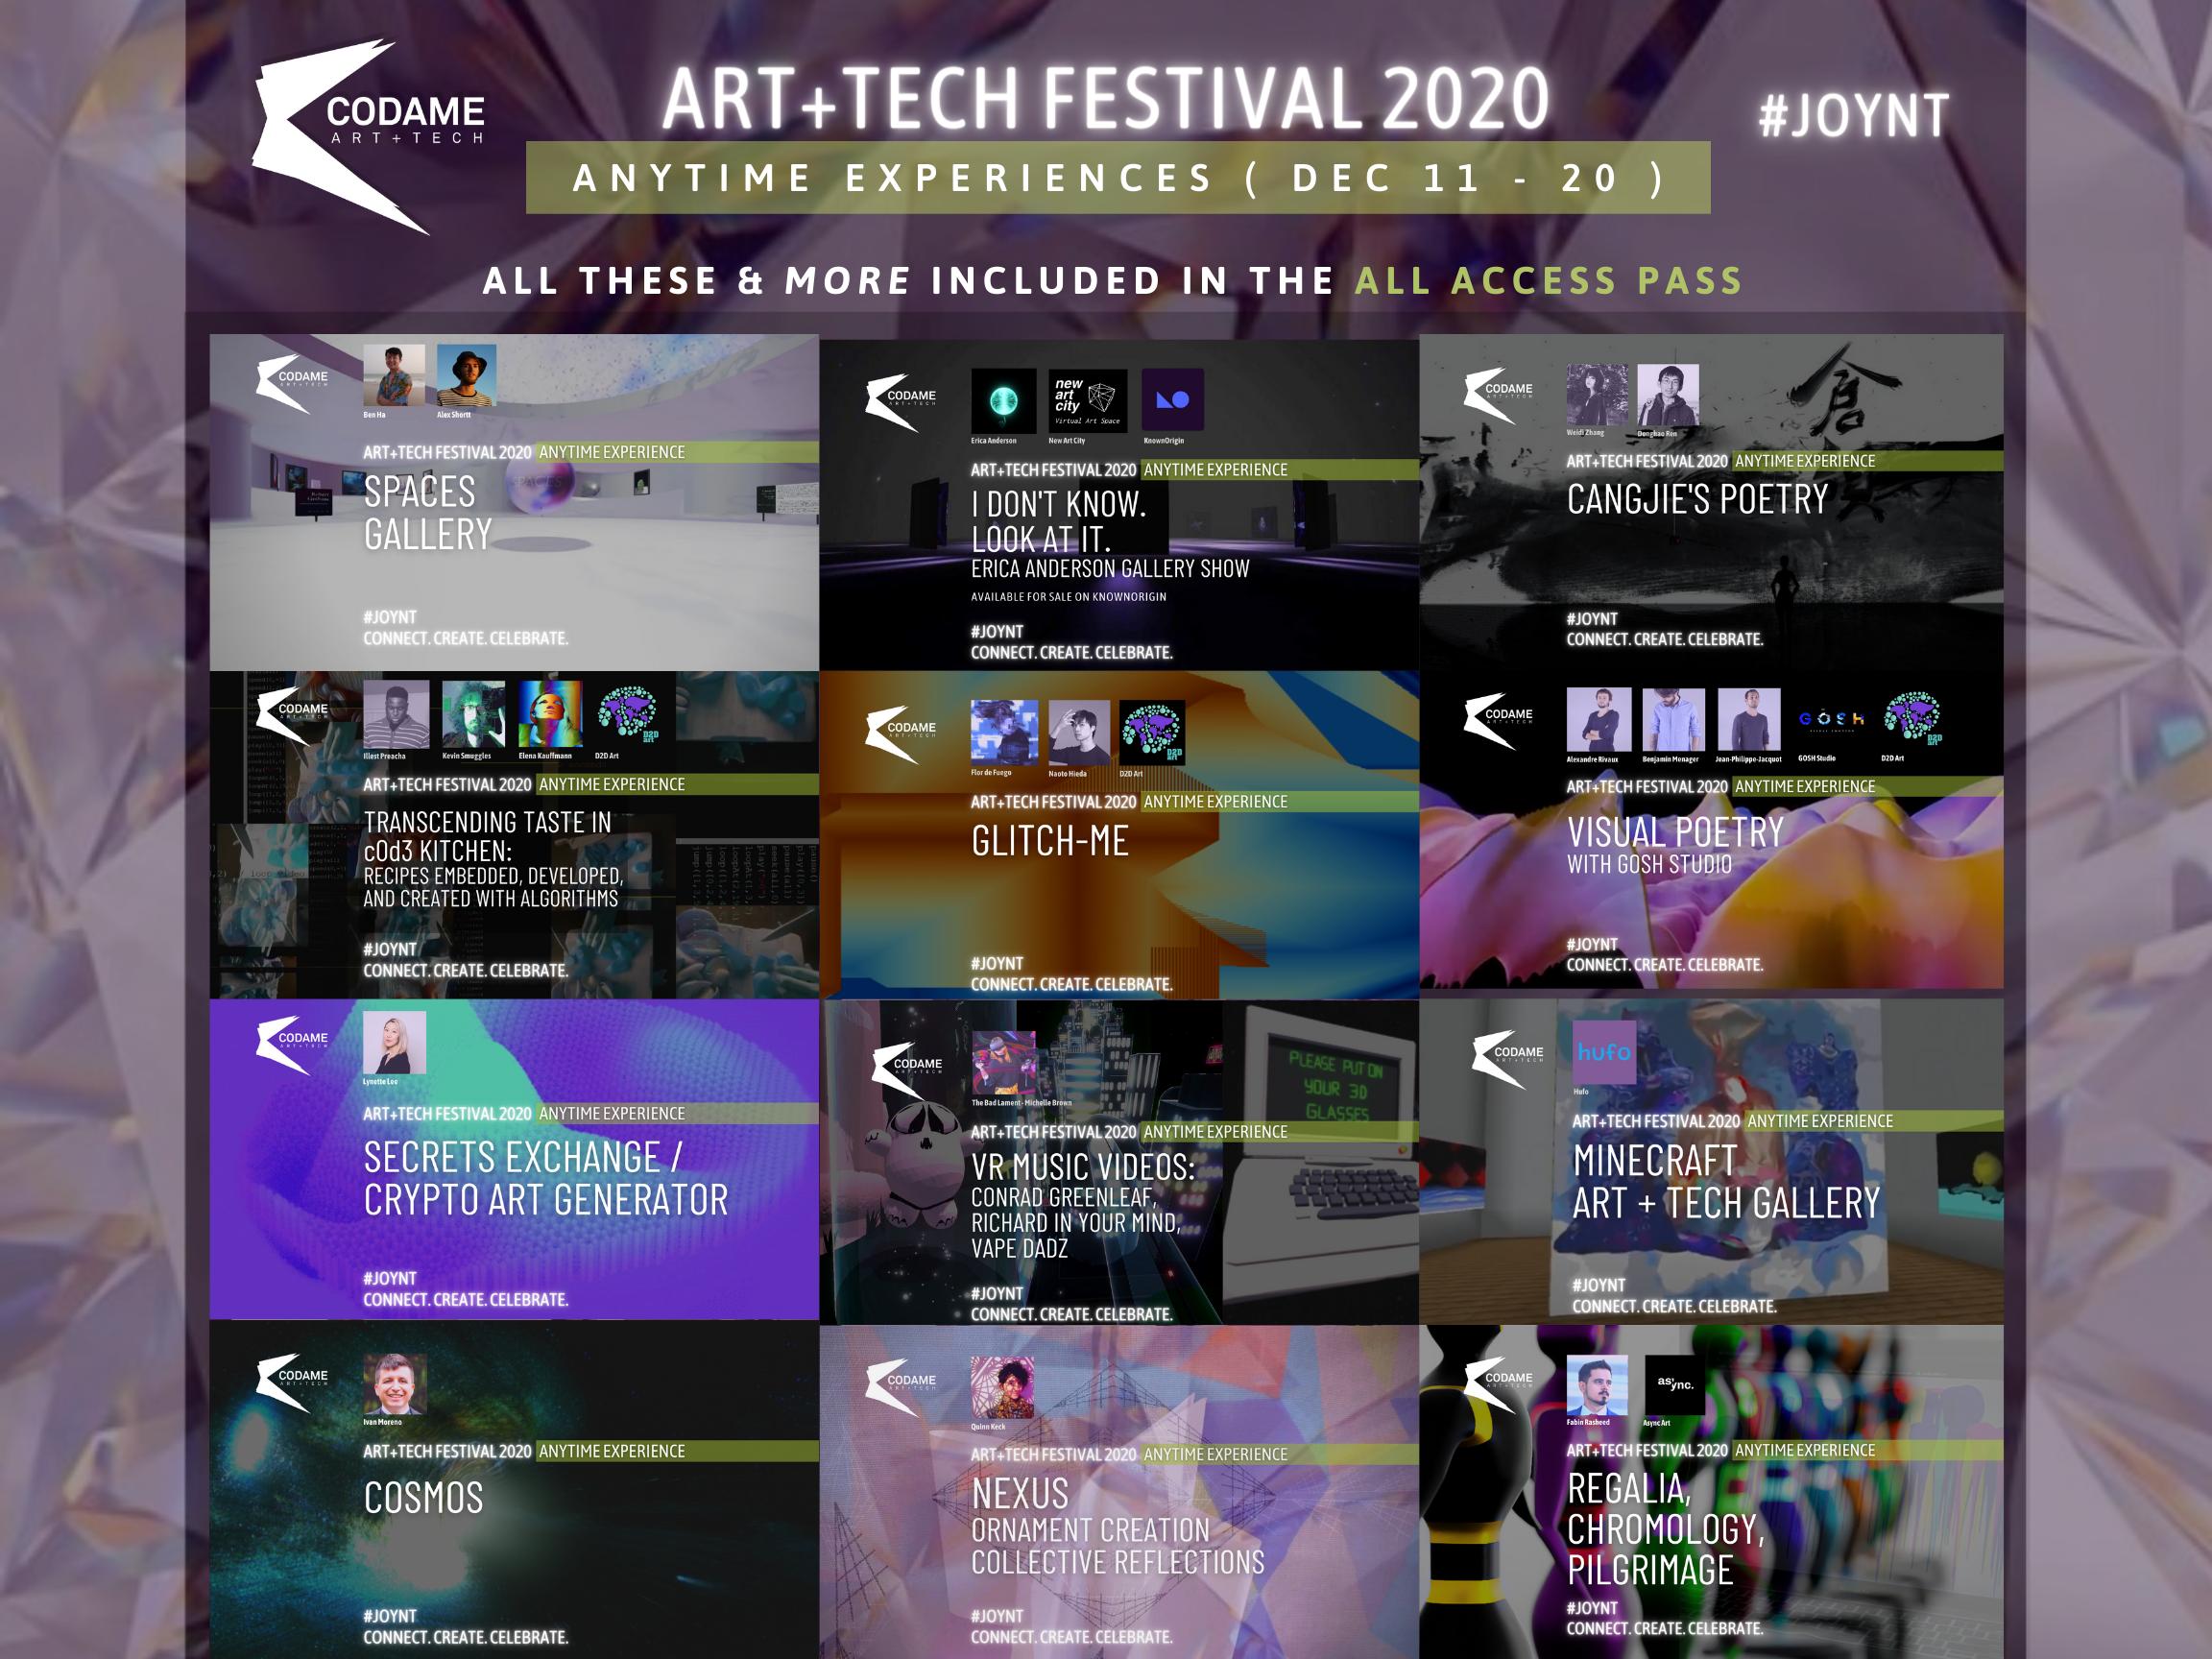 Anytime Experiences @ ART+TECH Festival 2020 『 JOYNT 』